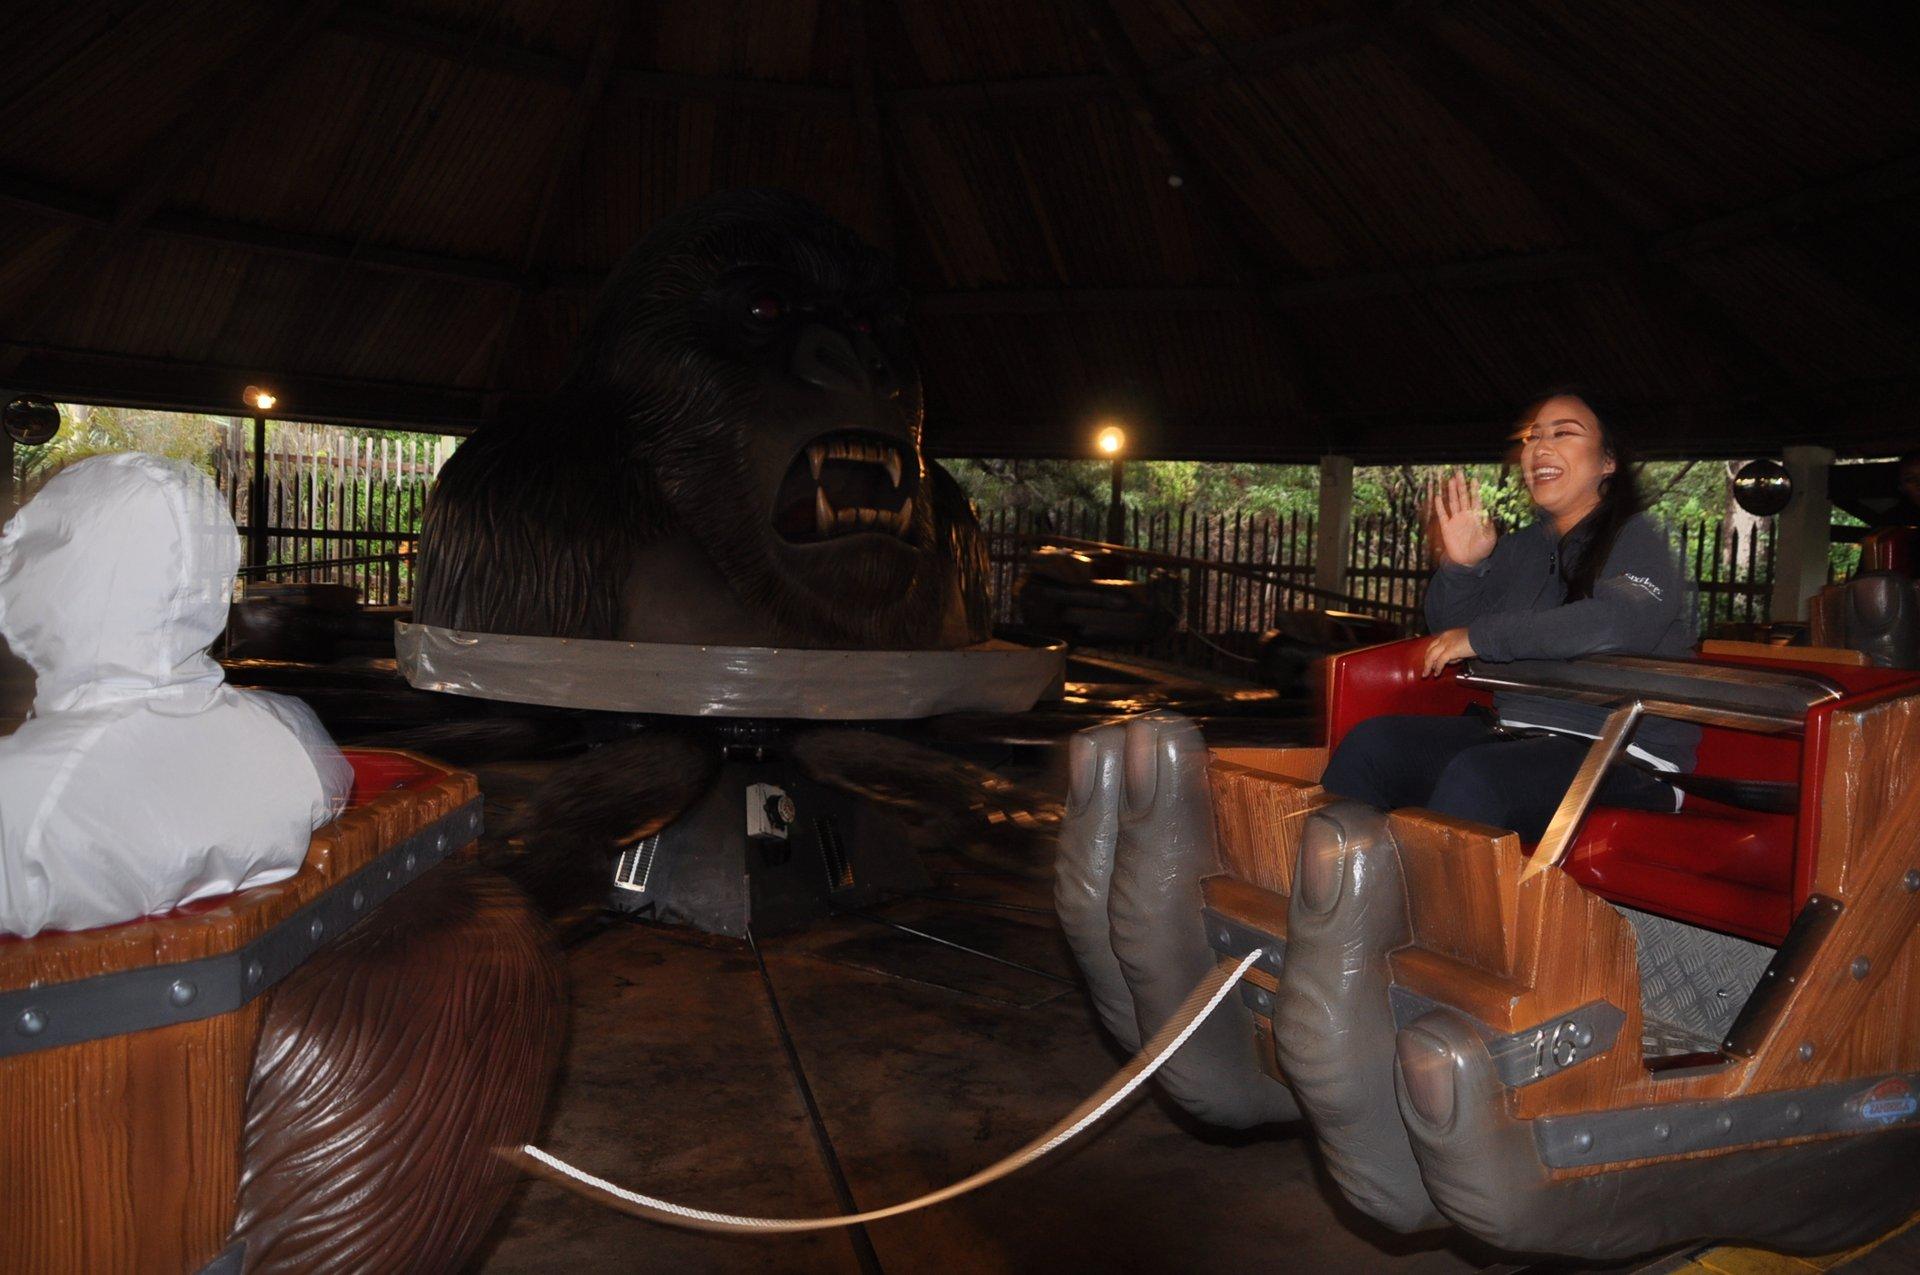 Woman smiling on spinning Gorilla ride.